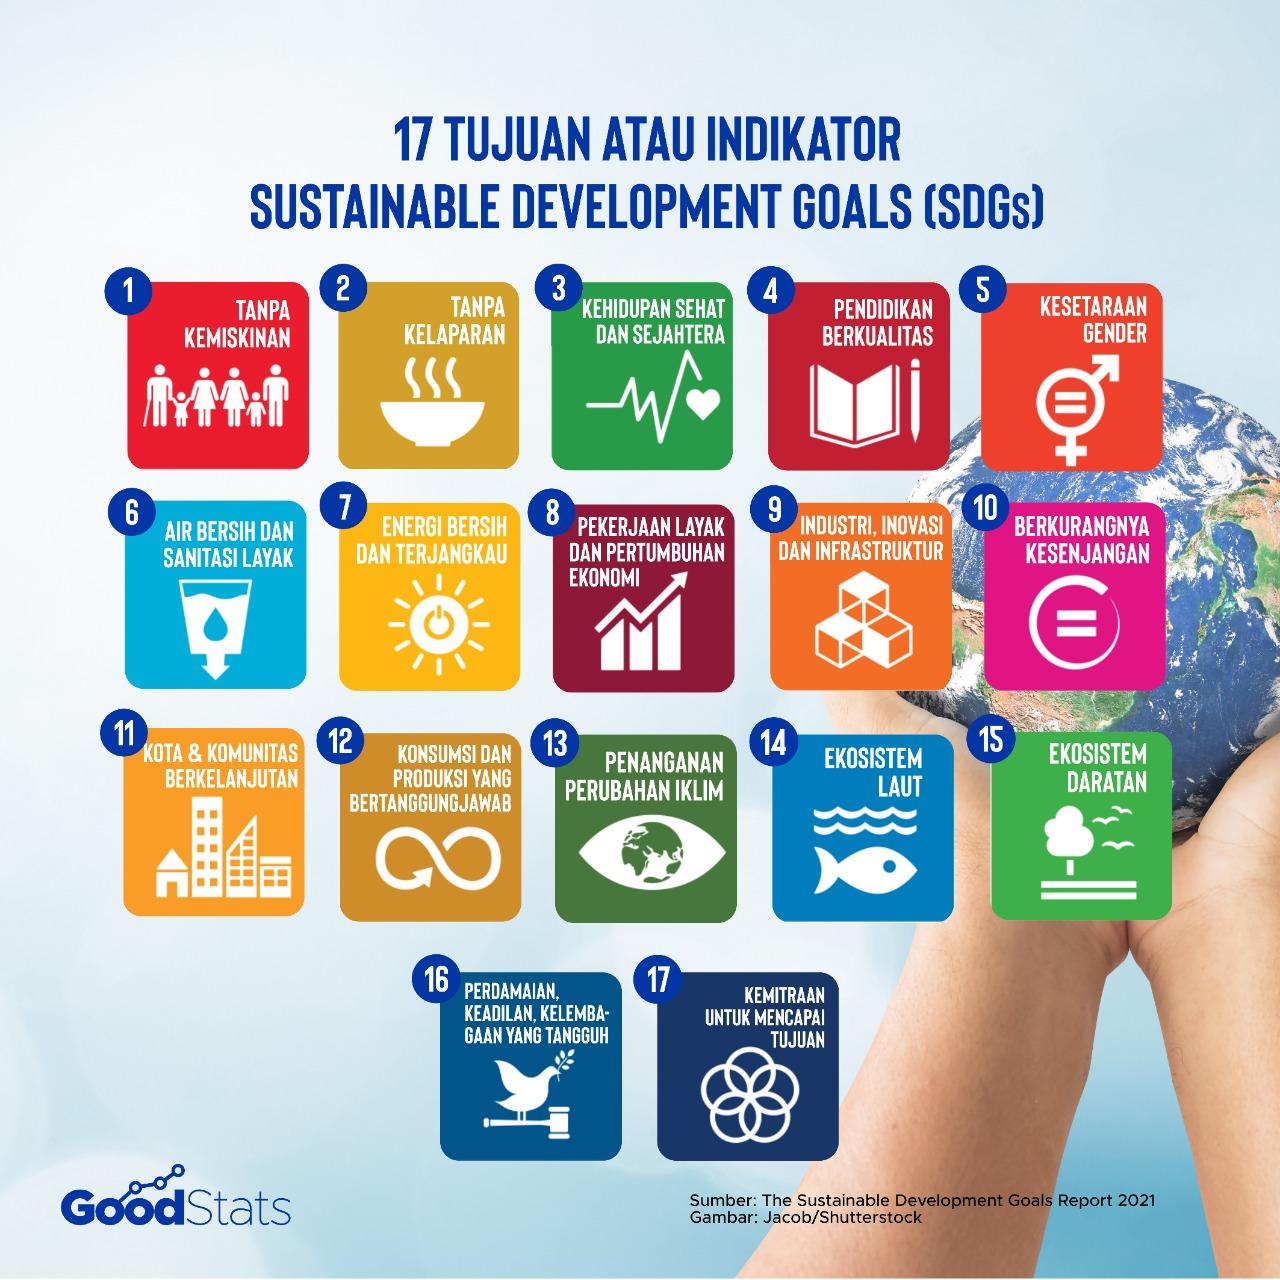 17 Tujuan Pembangunan Berkelanjutan atau Sustainable Development Goals (SDGs) | Foto : GoodStats